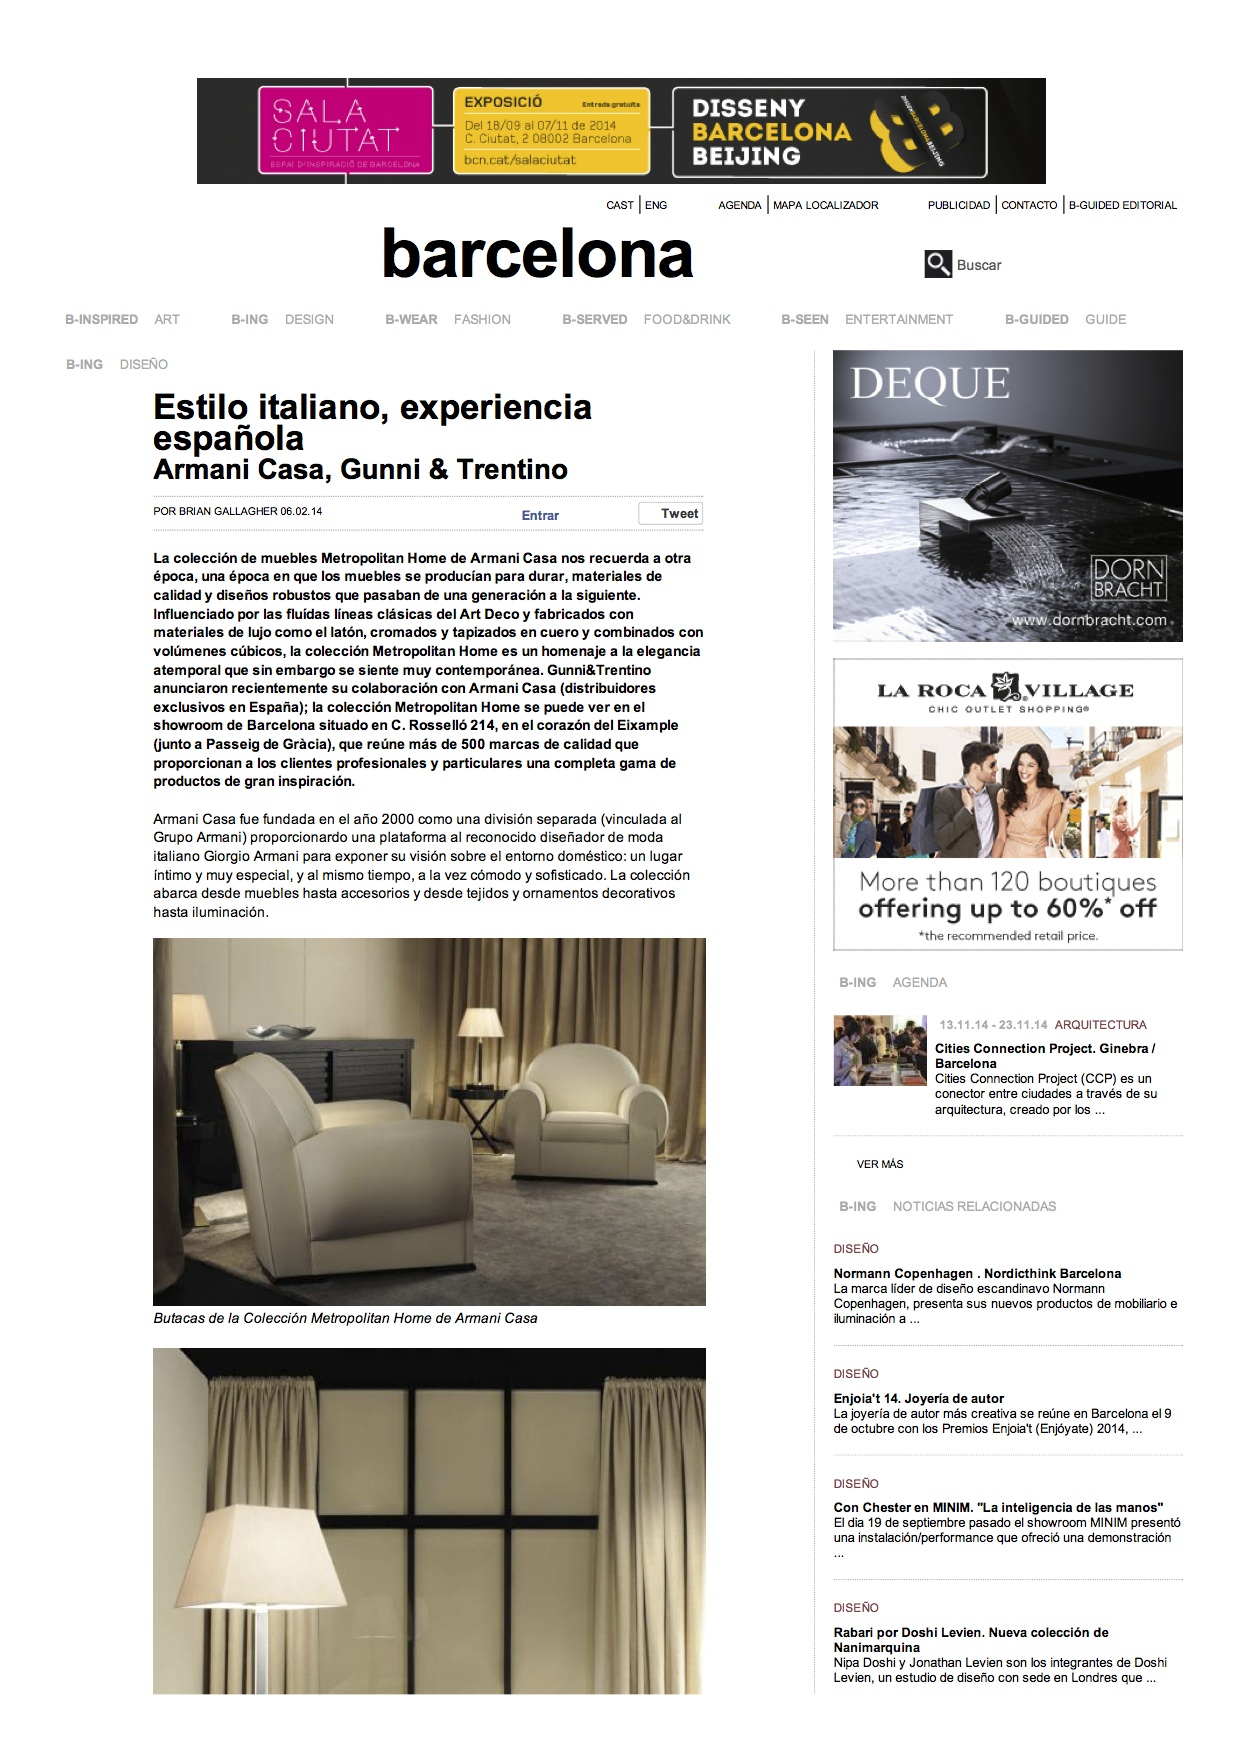 , B-Guided Barcelona febrero 2014, Gunni & Trentino